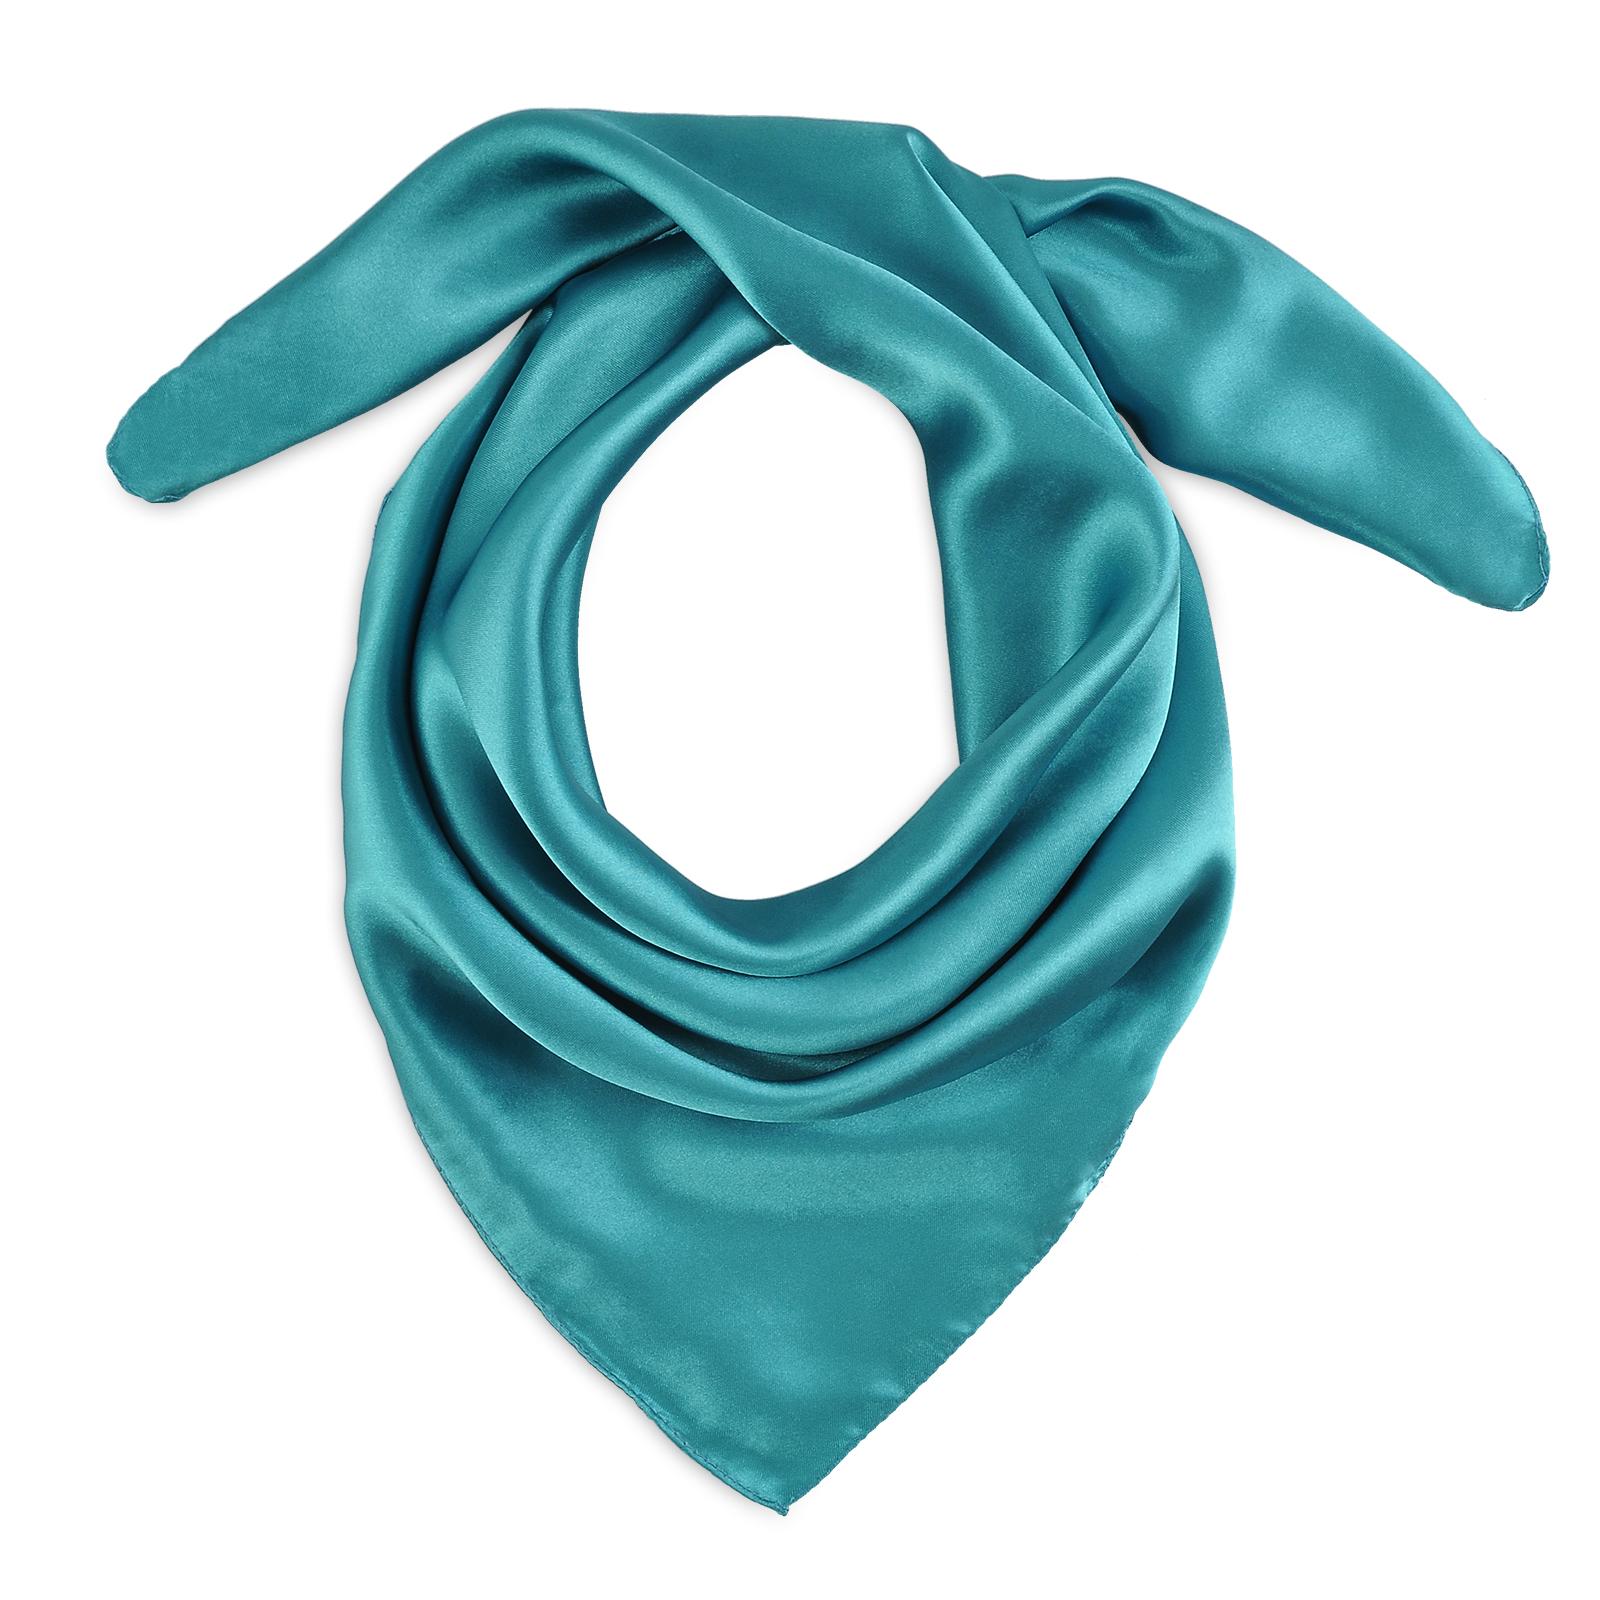 Foulard vert - Foulards femme et accessoires 994ea50ee9c